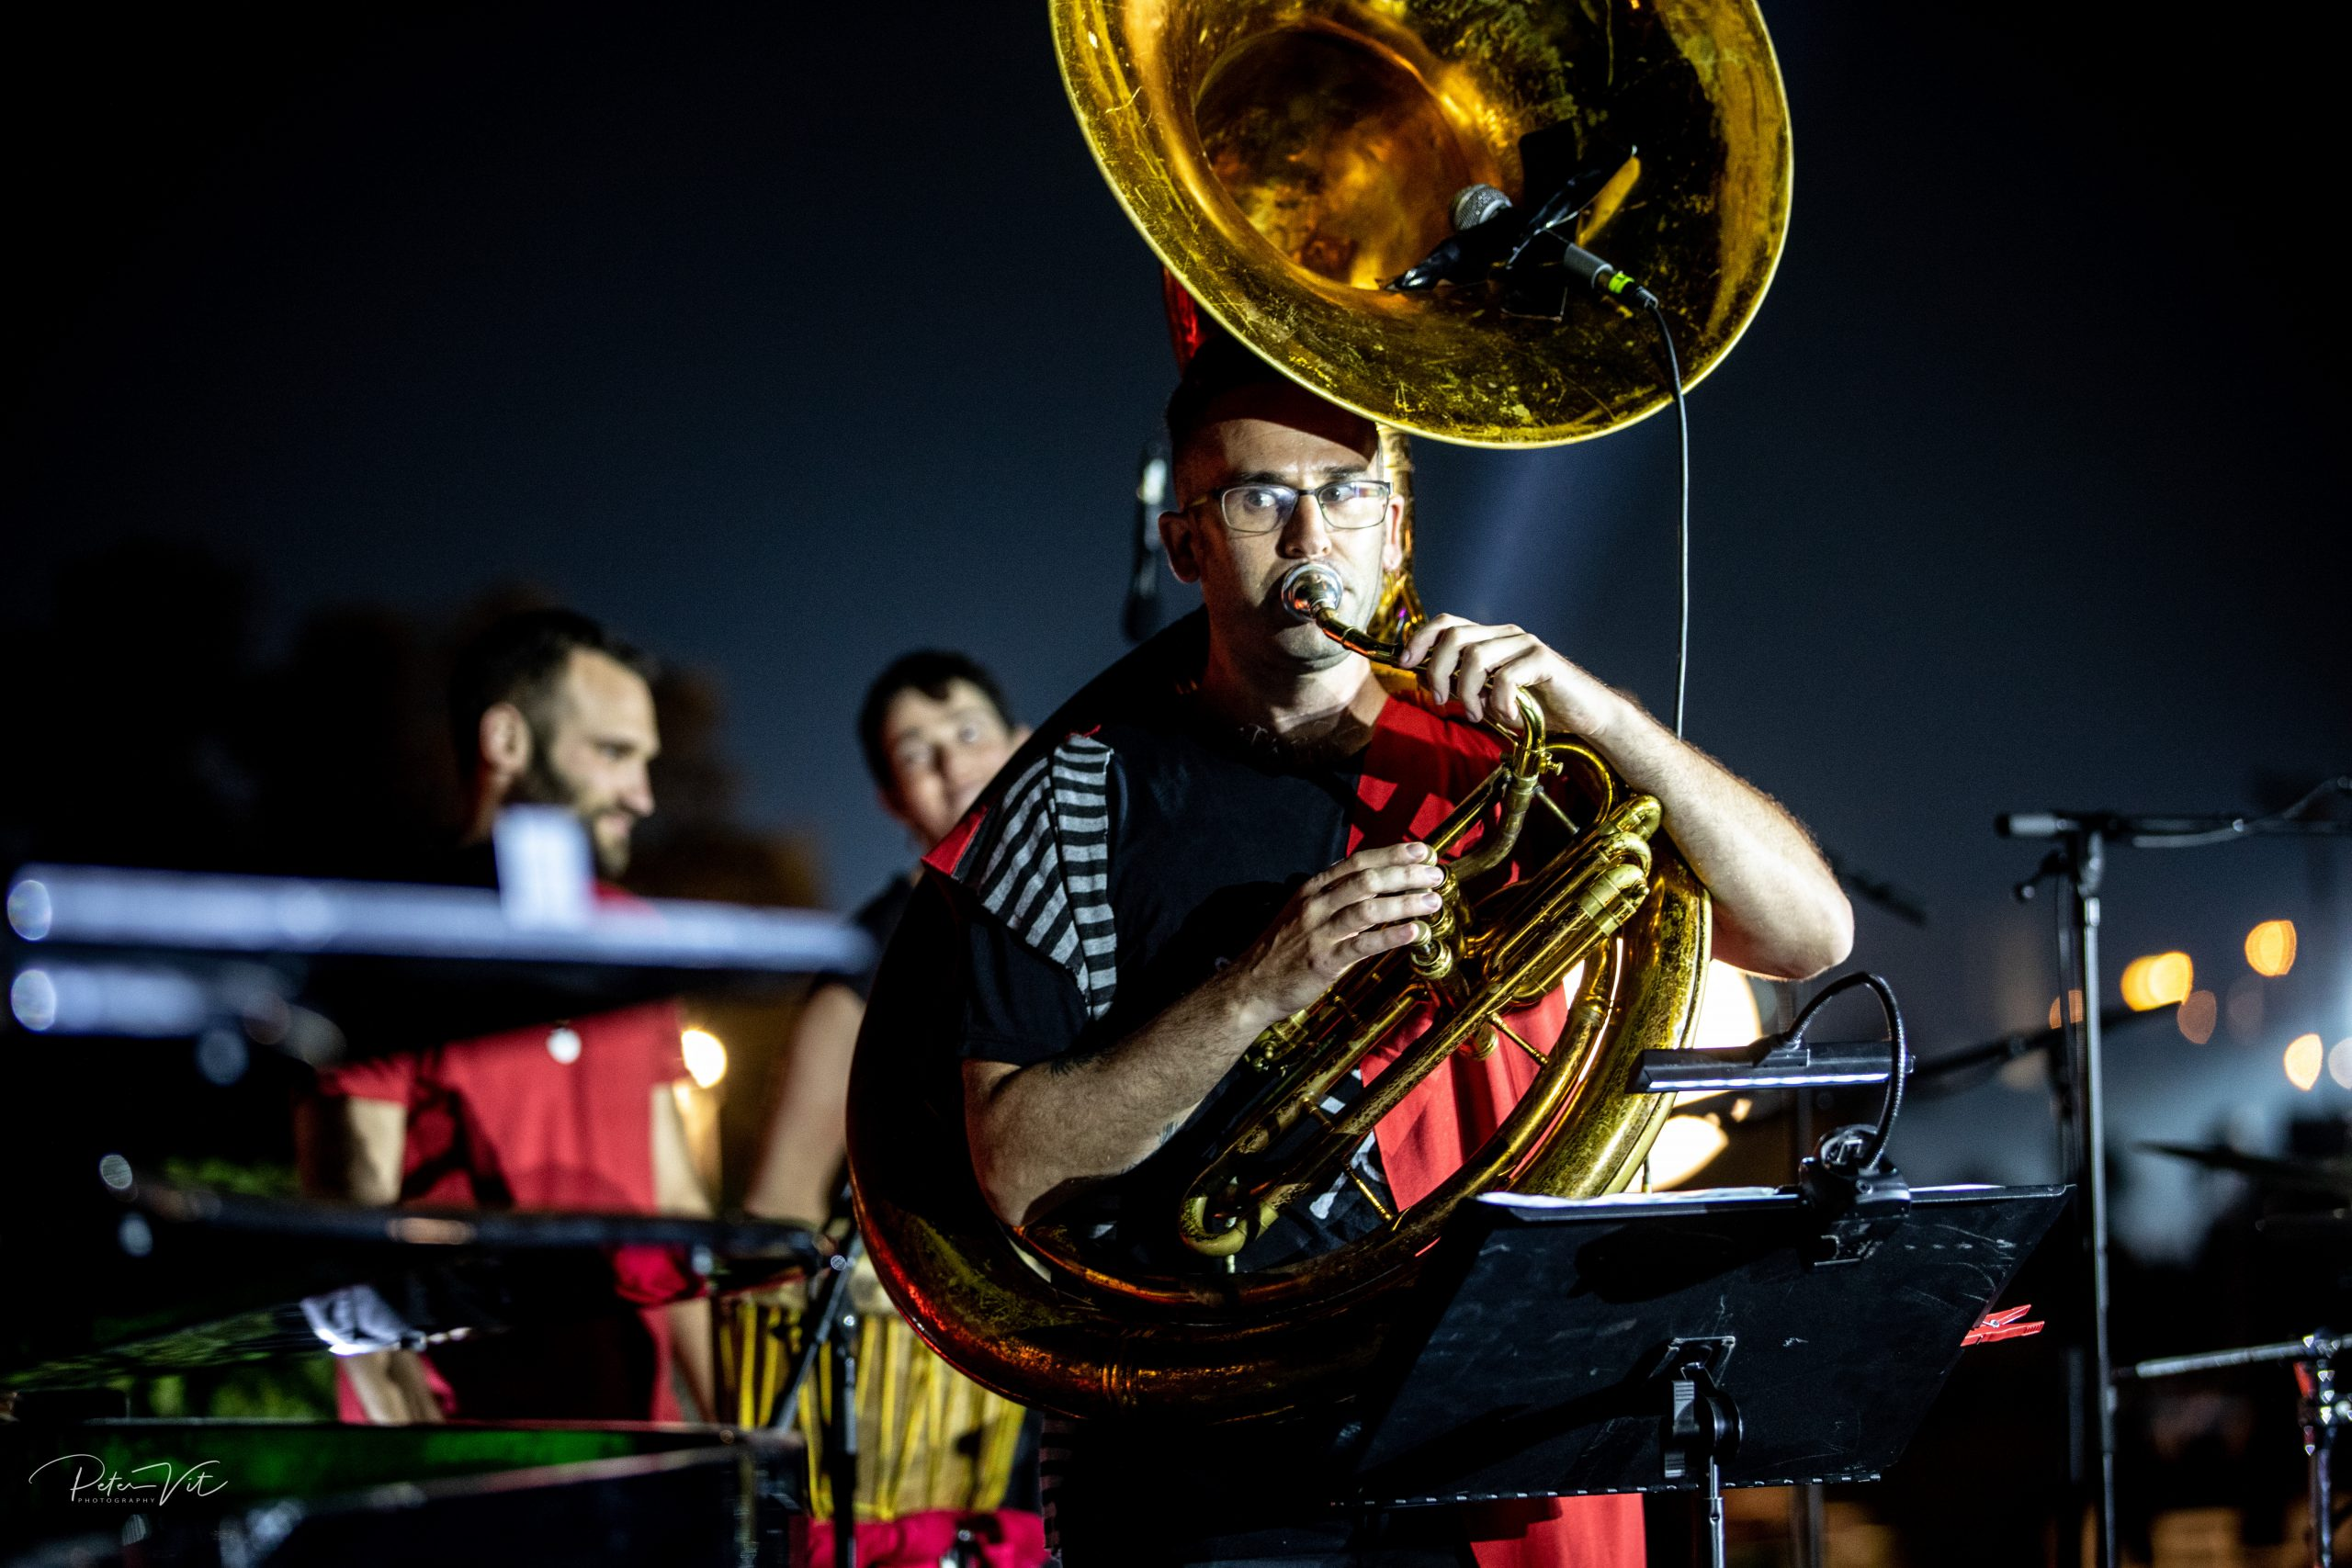 פסטיבל הג'אז 2021 @ Peter Vit